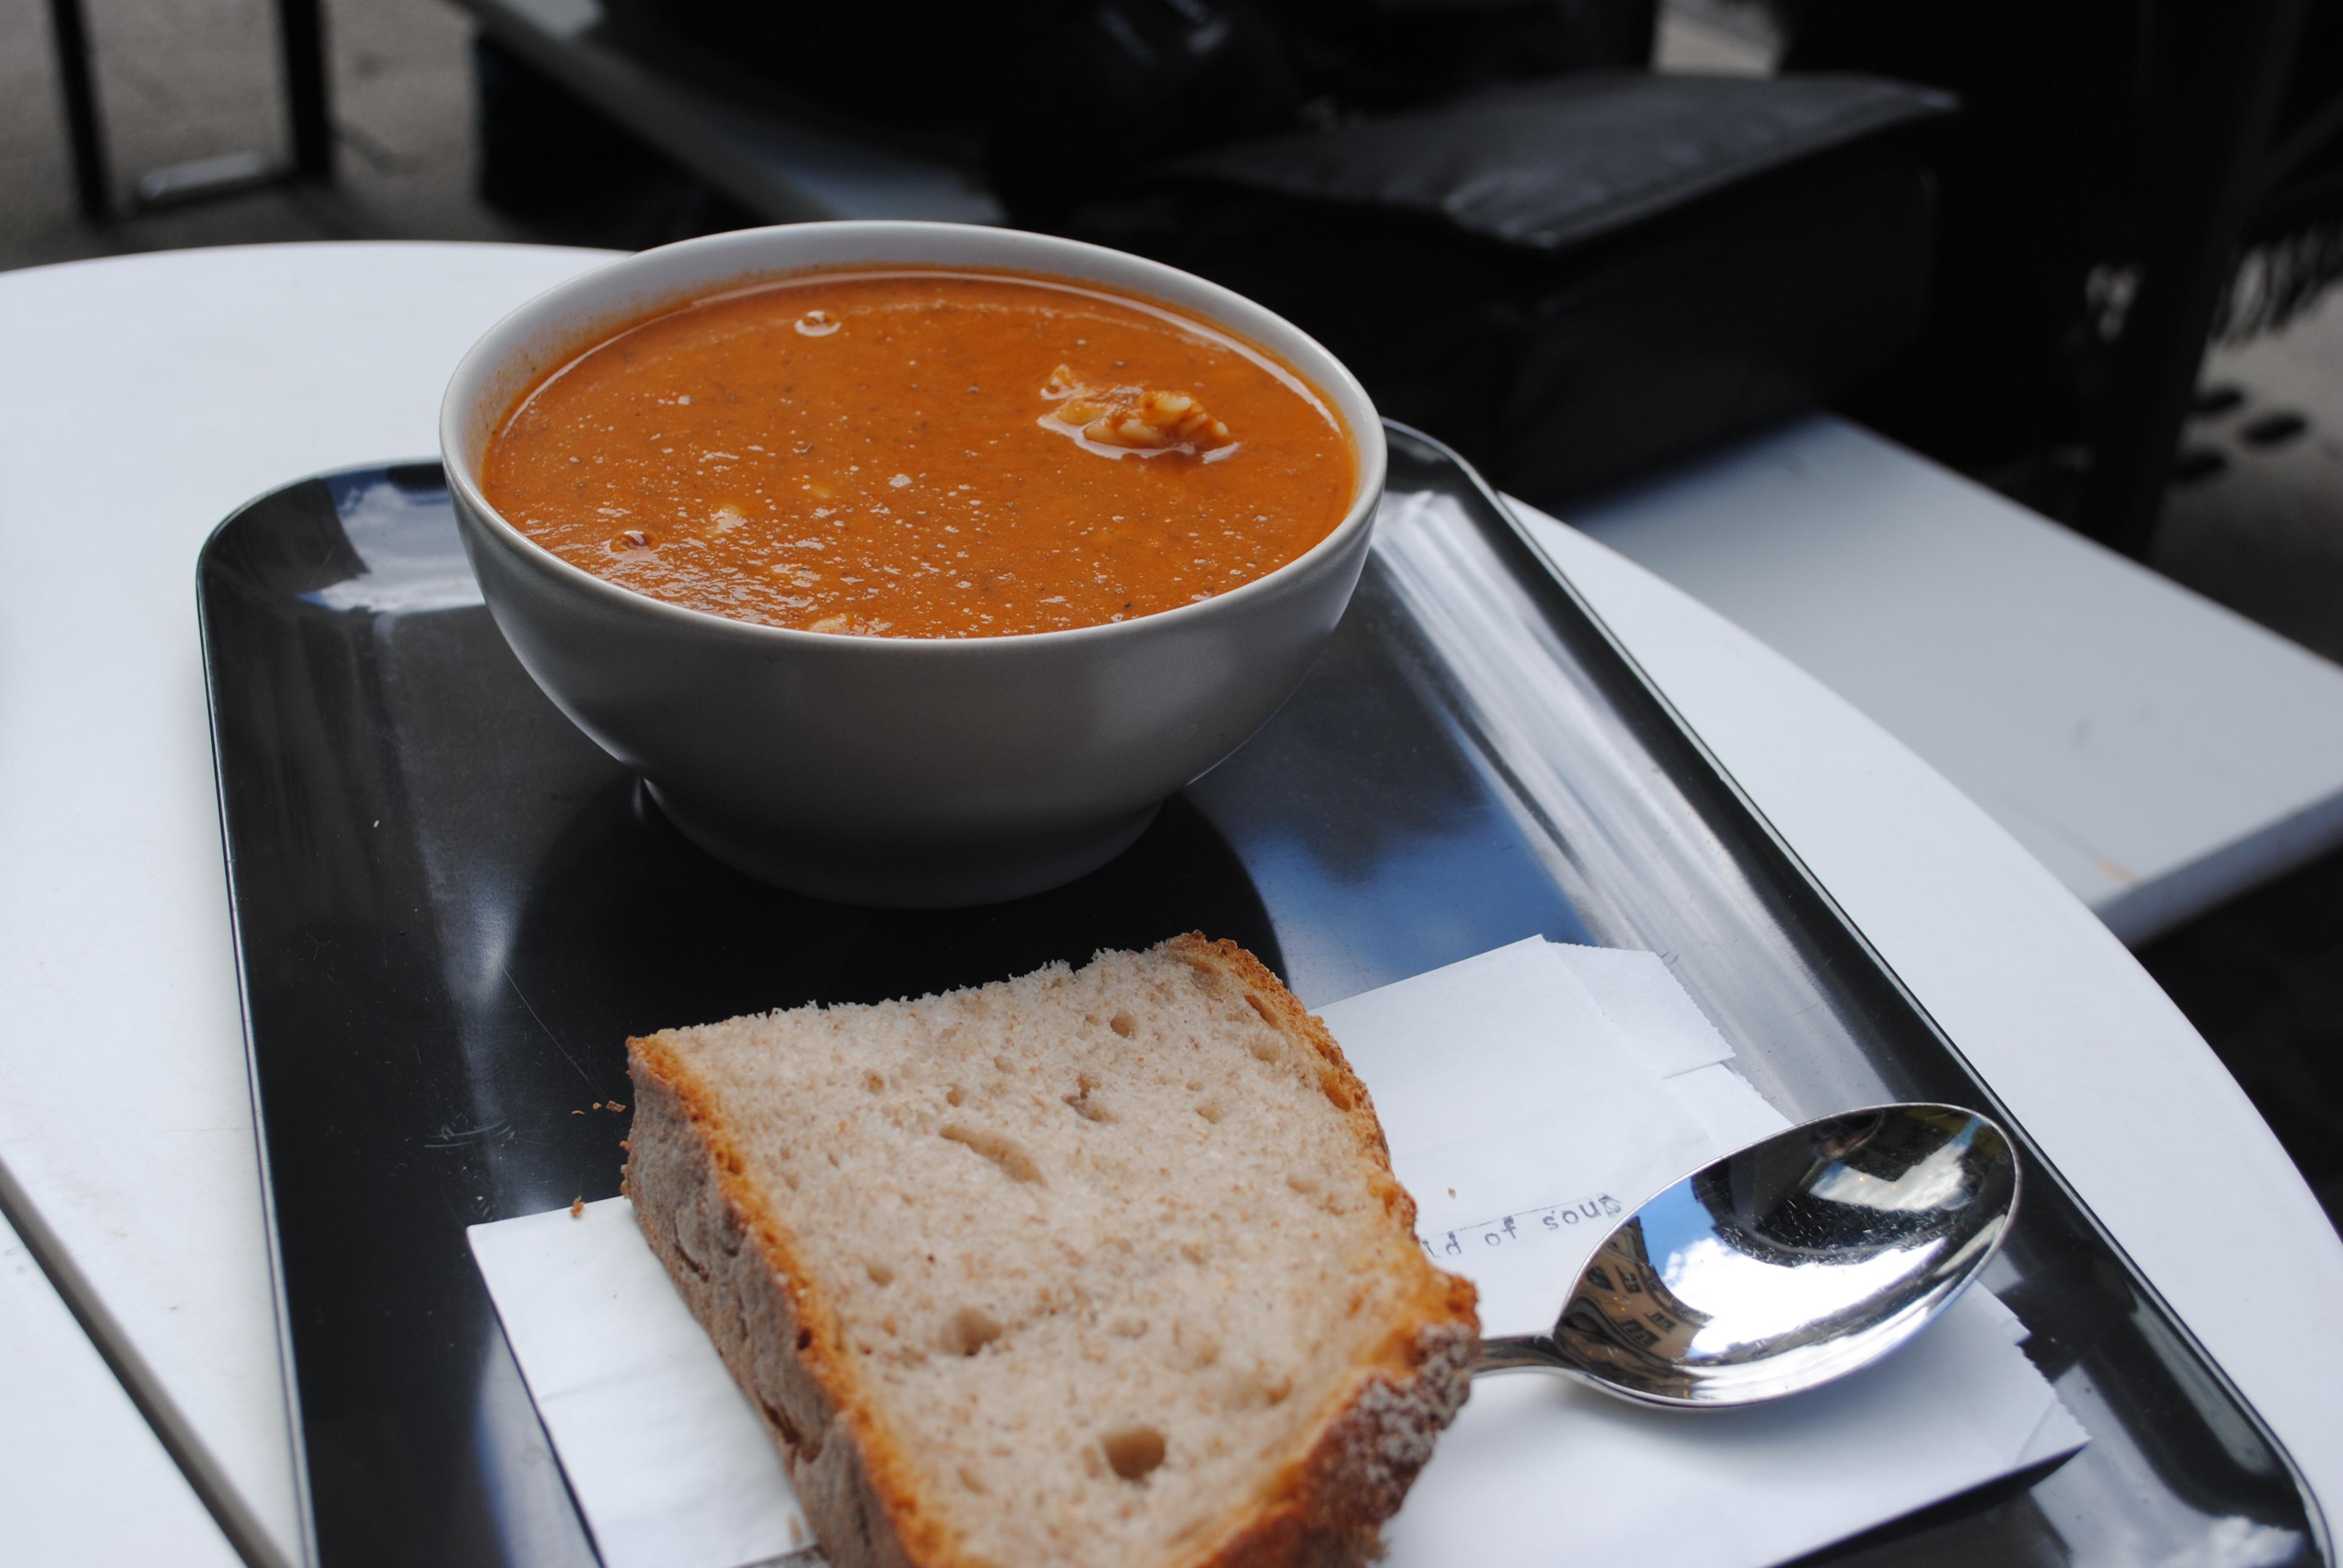 Fotos gratis : cafetería, restaurante, naranja, plato, comida ...